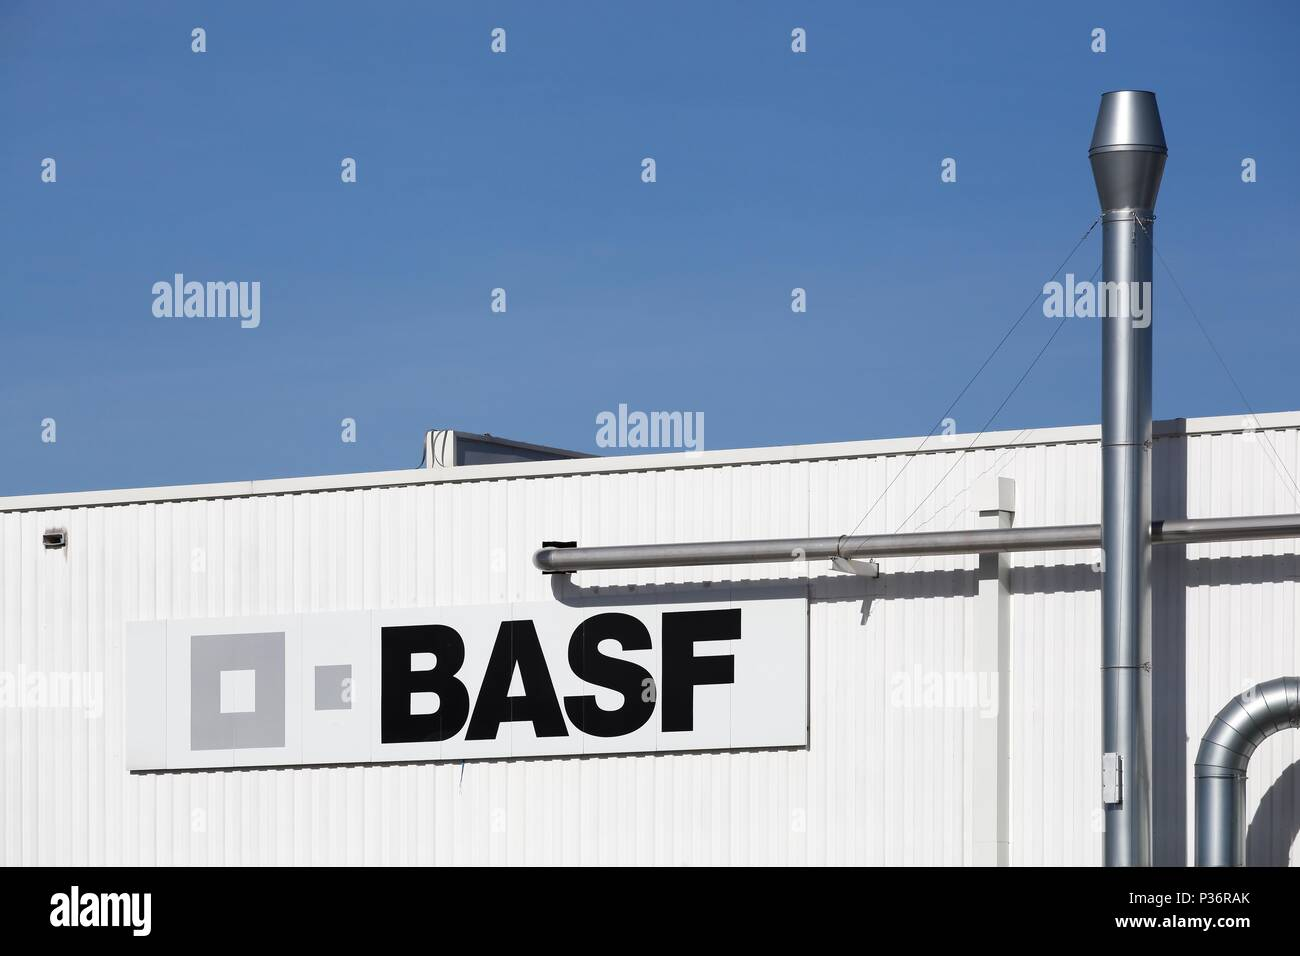 Basf Building Stock Photos & Basf Building Stock Images - Alamy